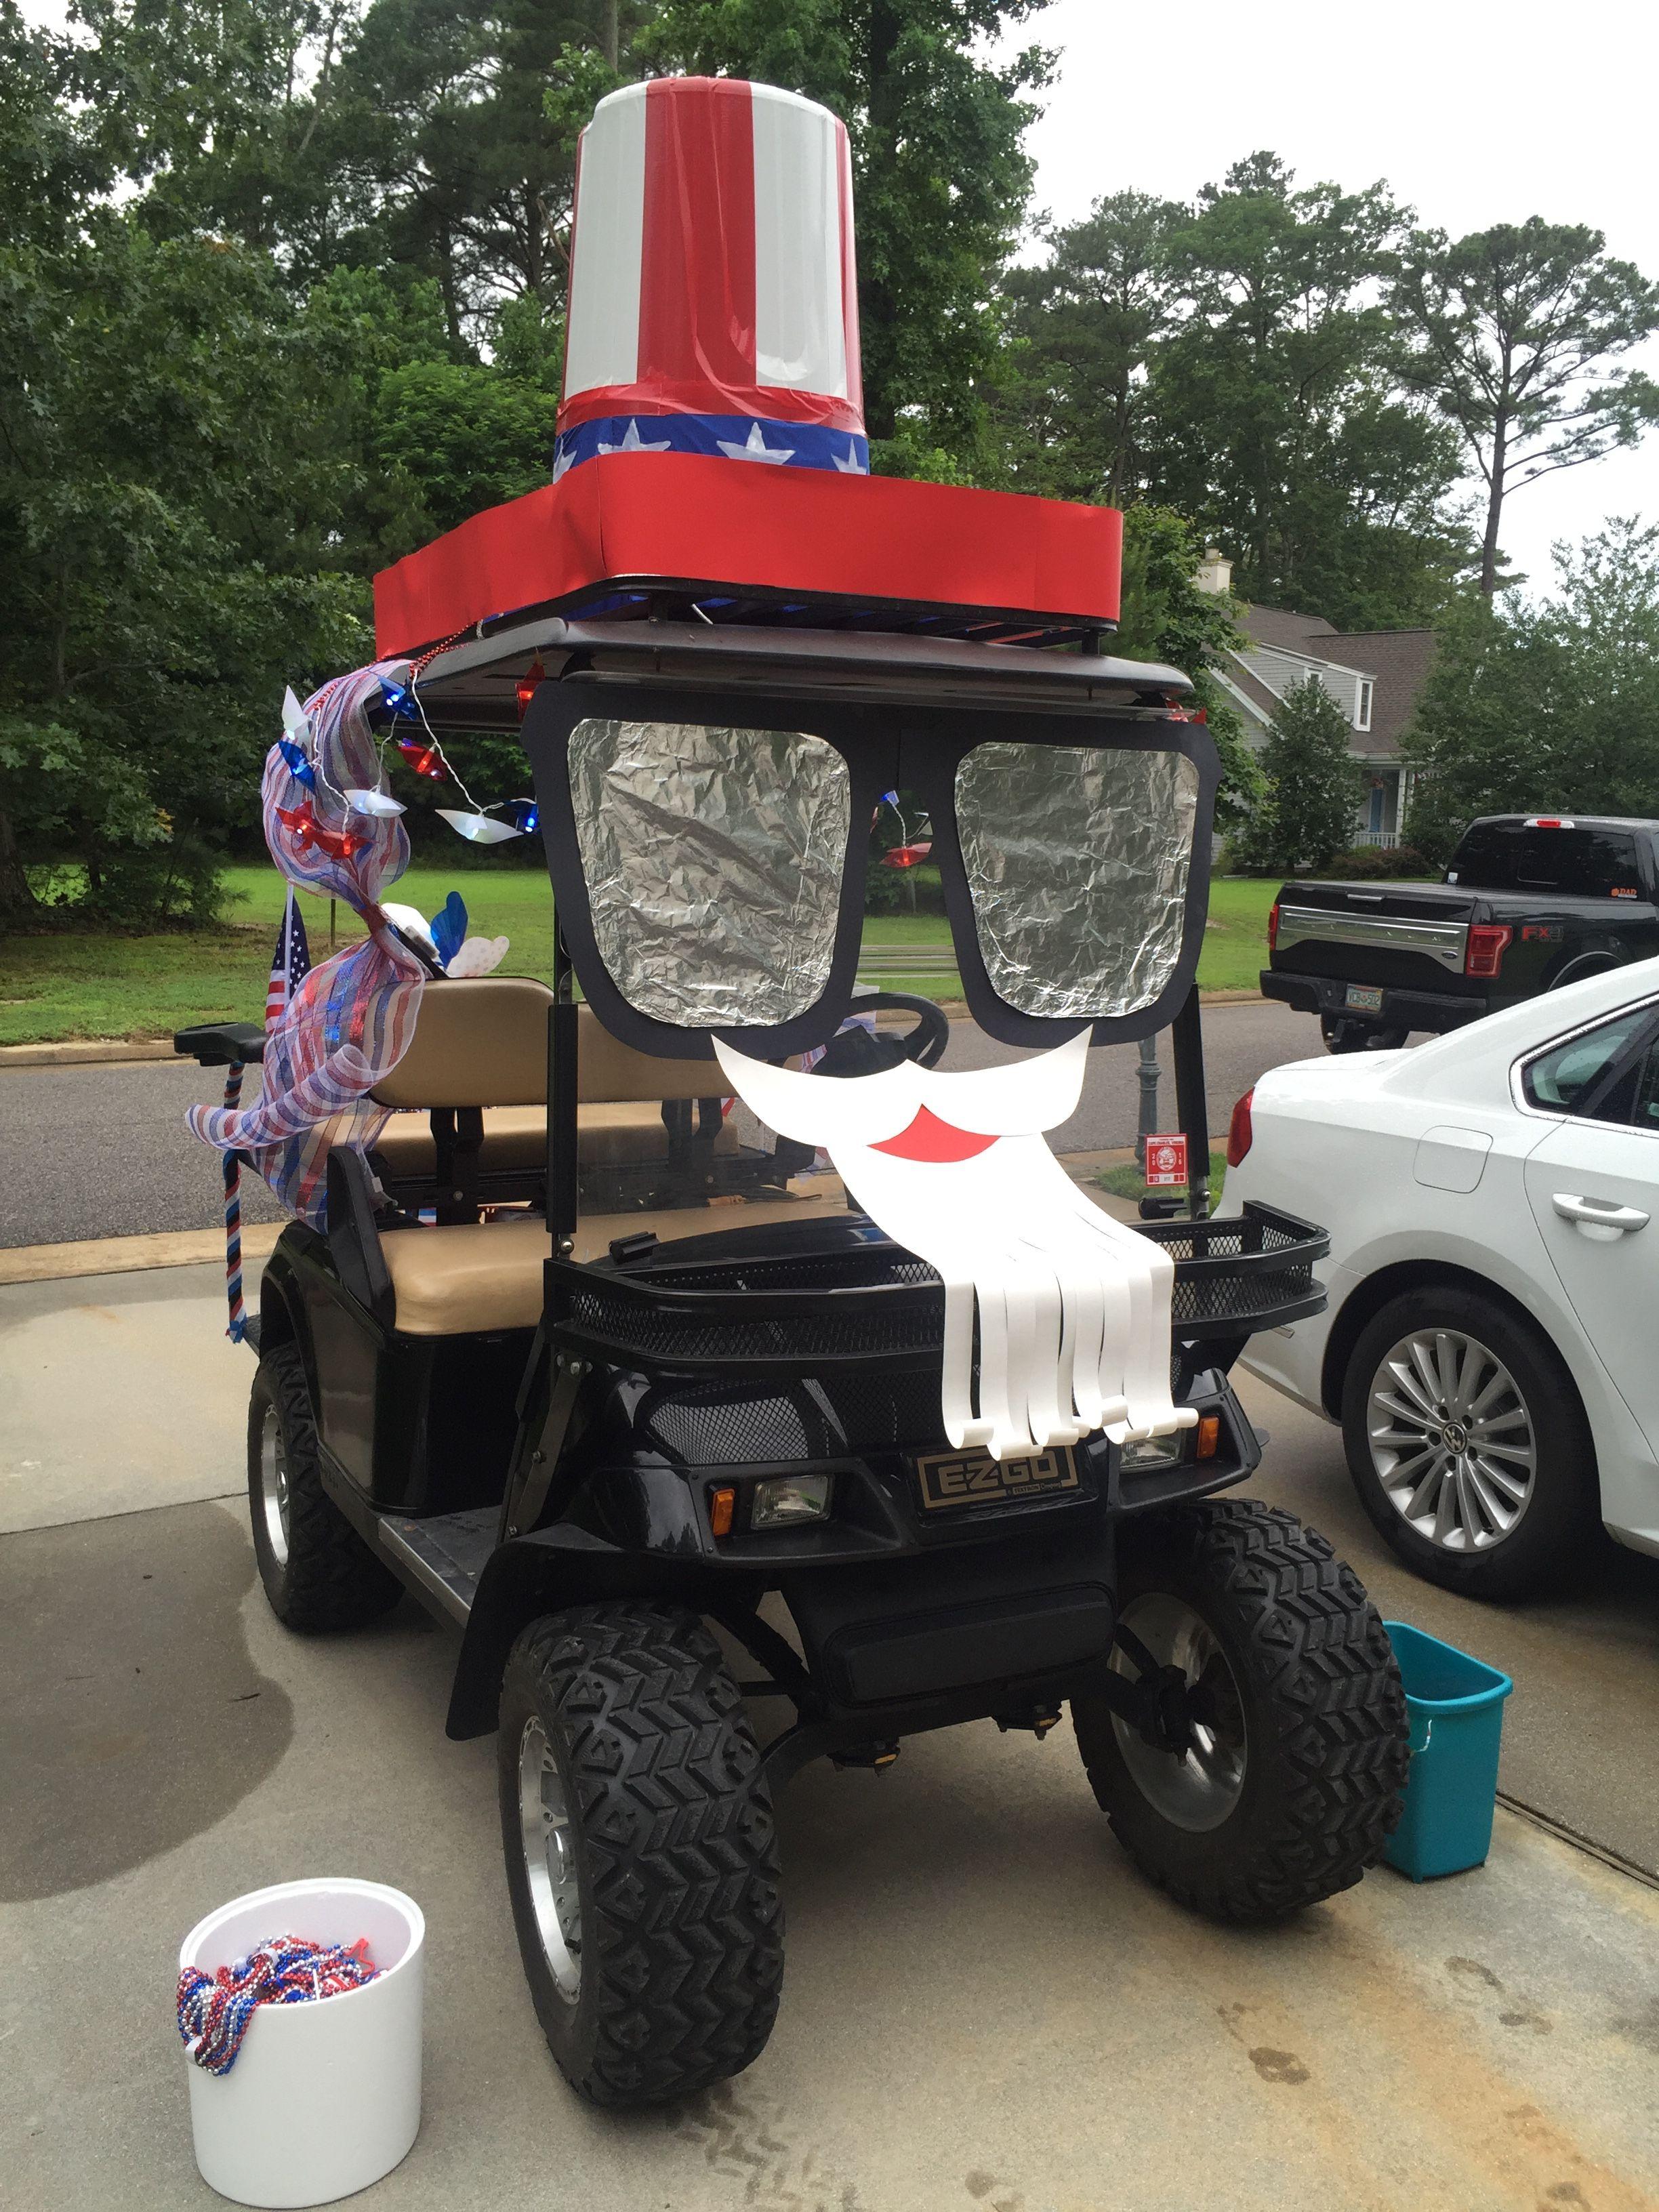 Uncle Sam golf cart decorating parade forth of July hat sunglasses beard 4206ad4e90b